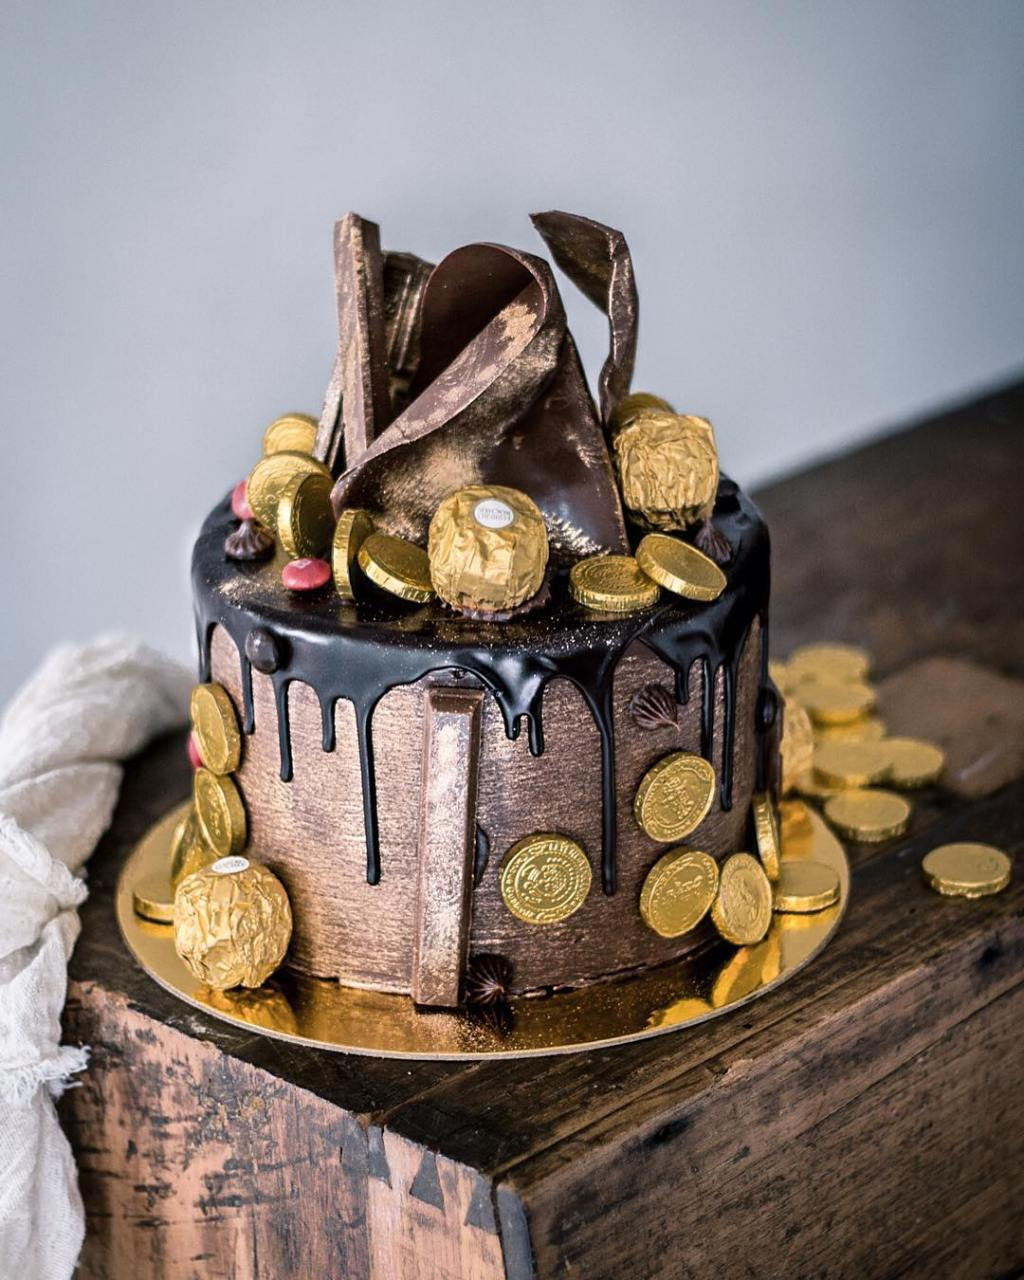 julian-angel-cakes-fairytales-5